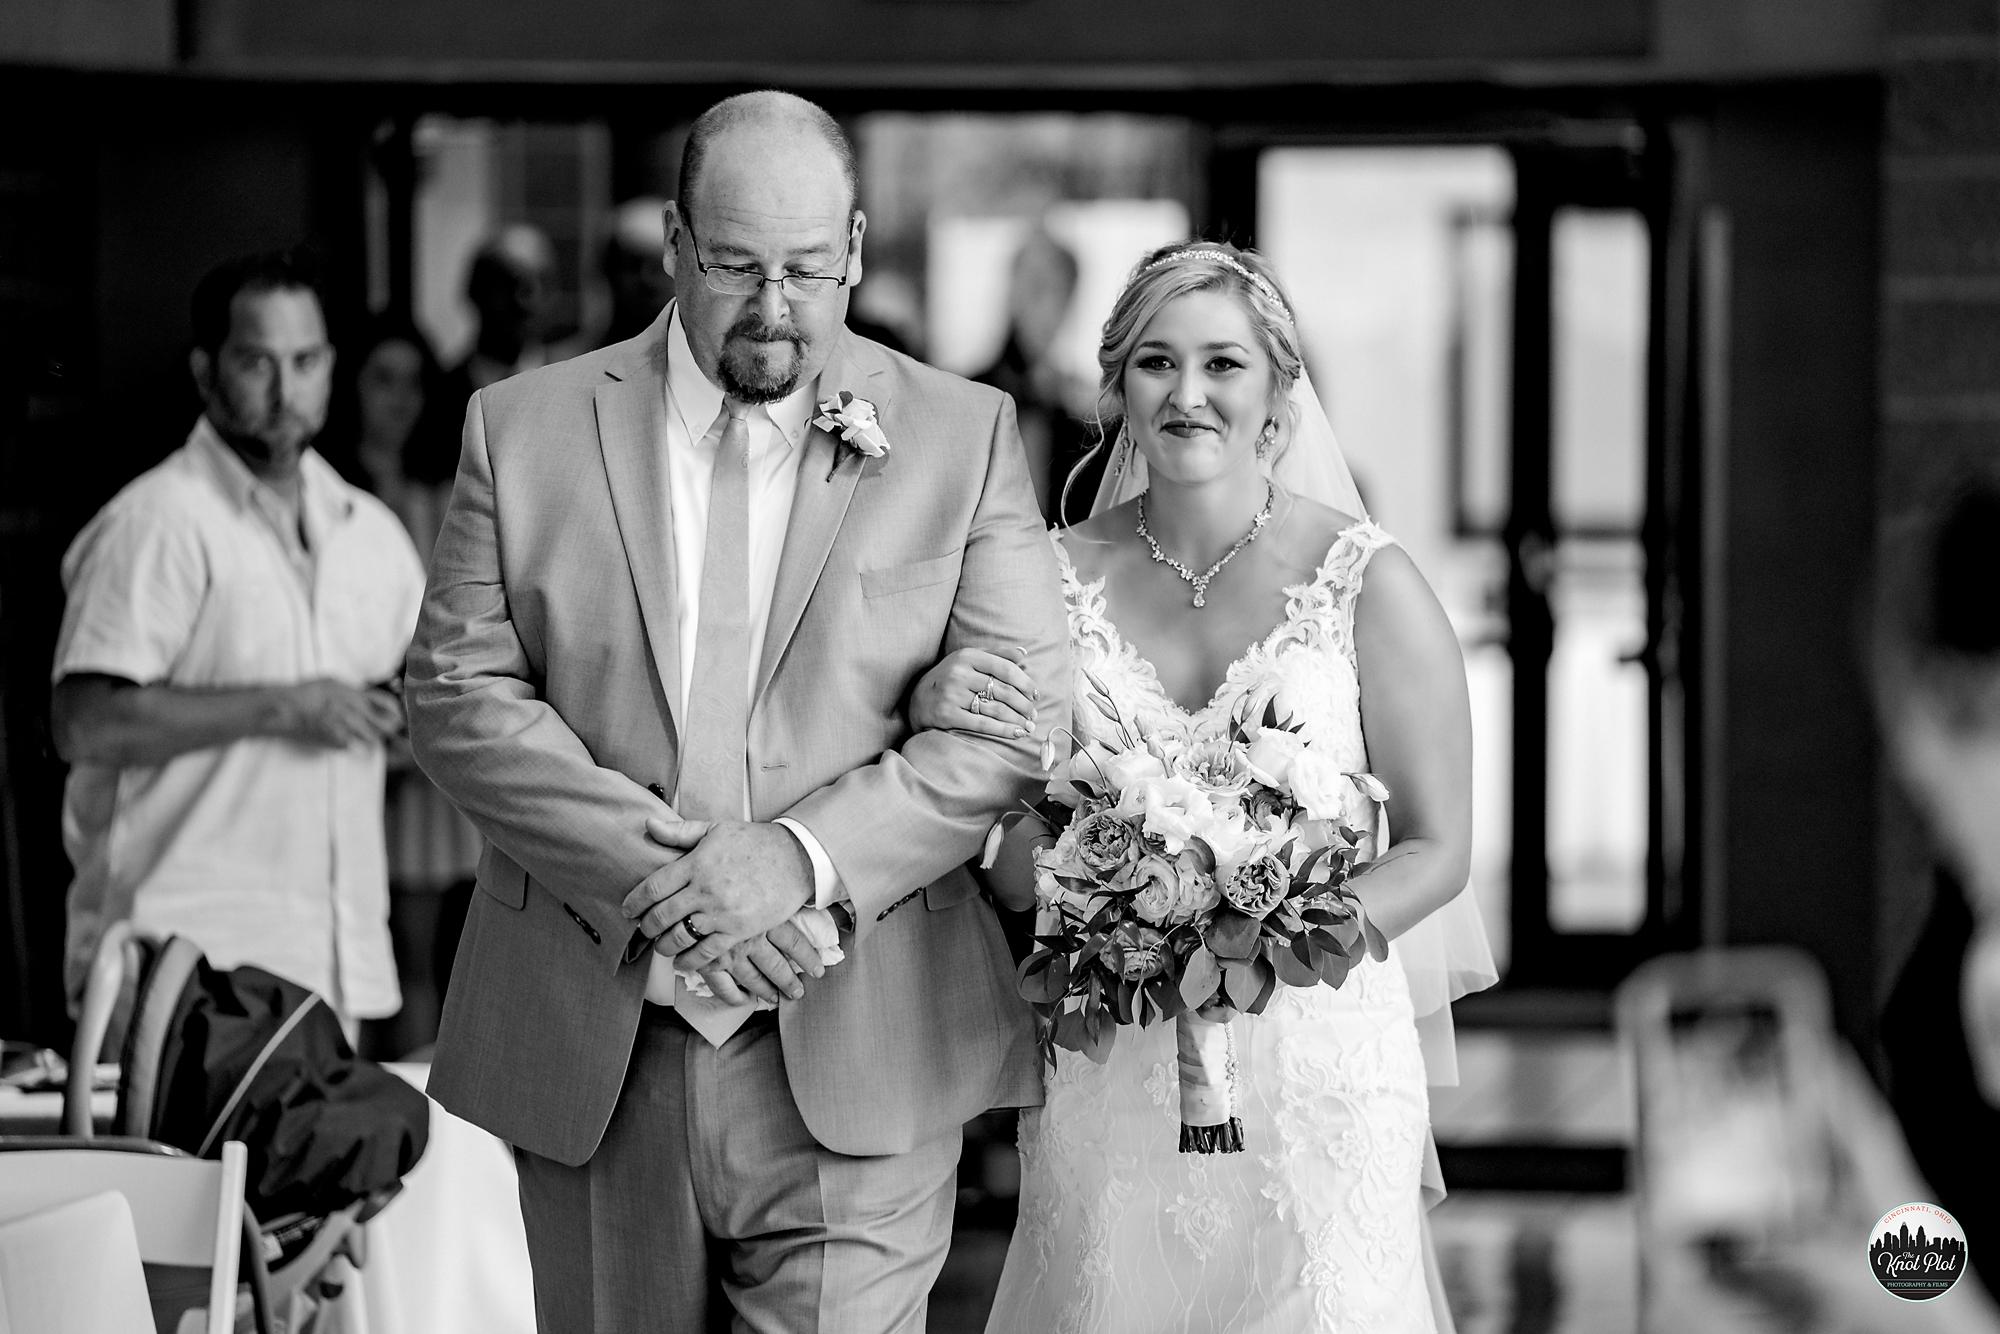 Southgate-Community-Center-KY-Wedding-Photography-11.jpg